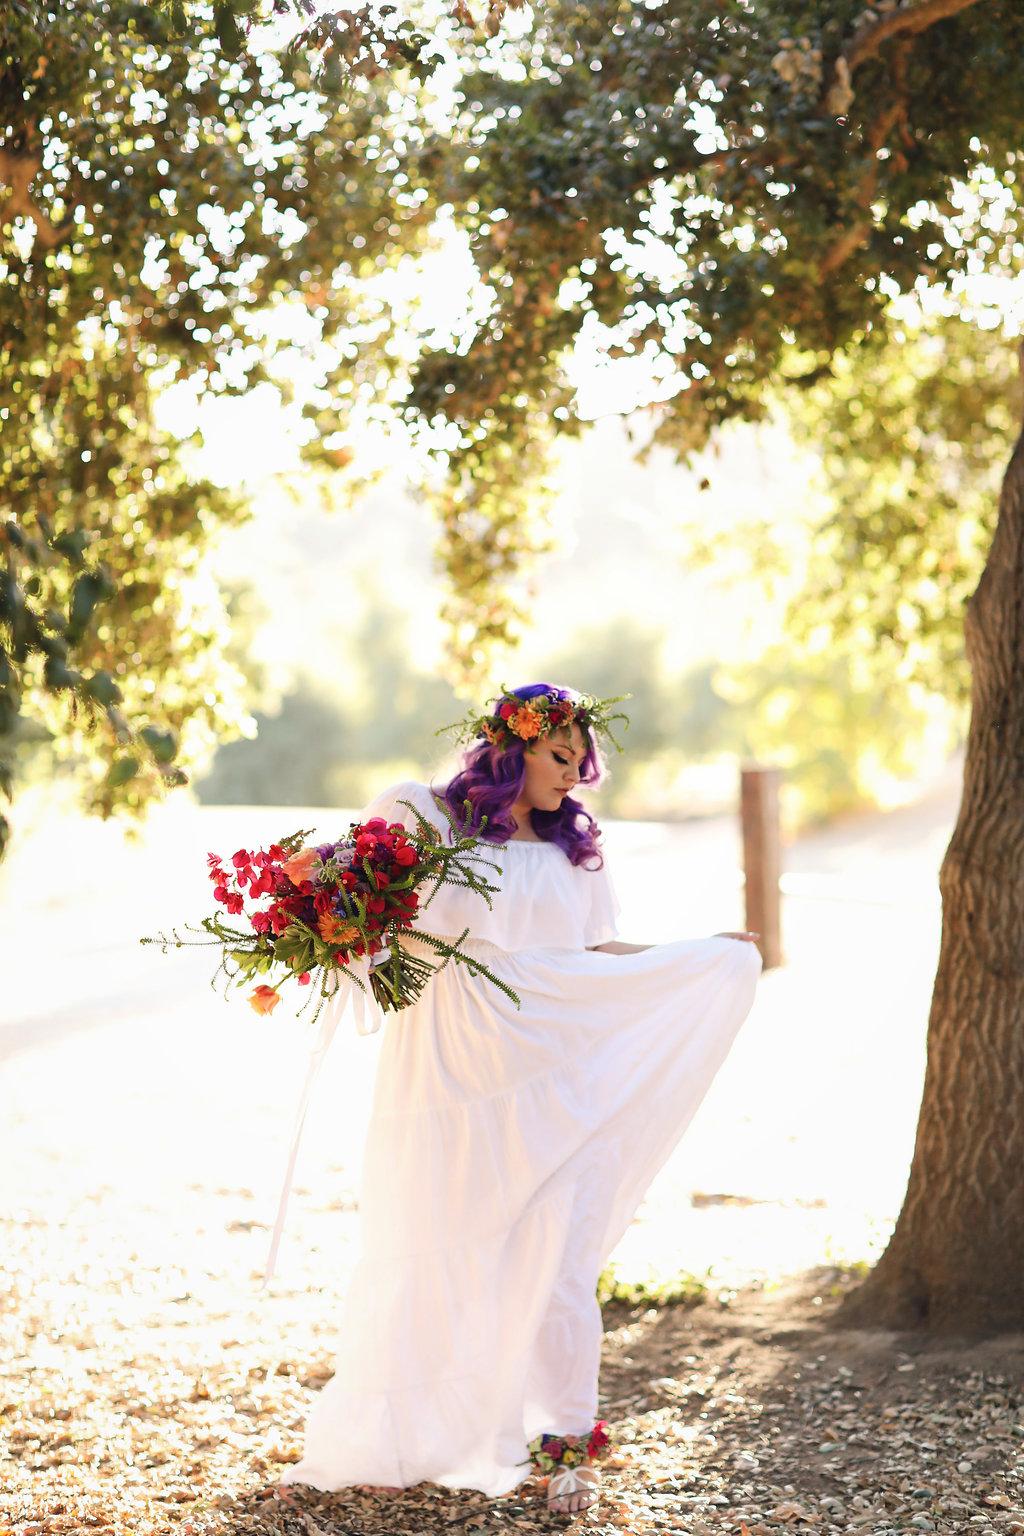 Ultra violet bride at Chateau Adare wedding venue in Murrieta, California. Dress Hippie Boho Shop